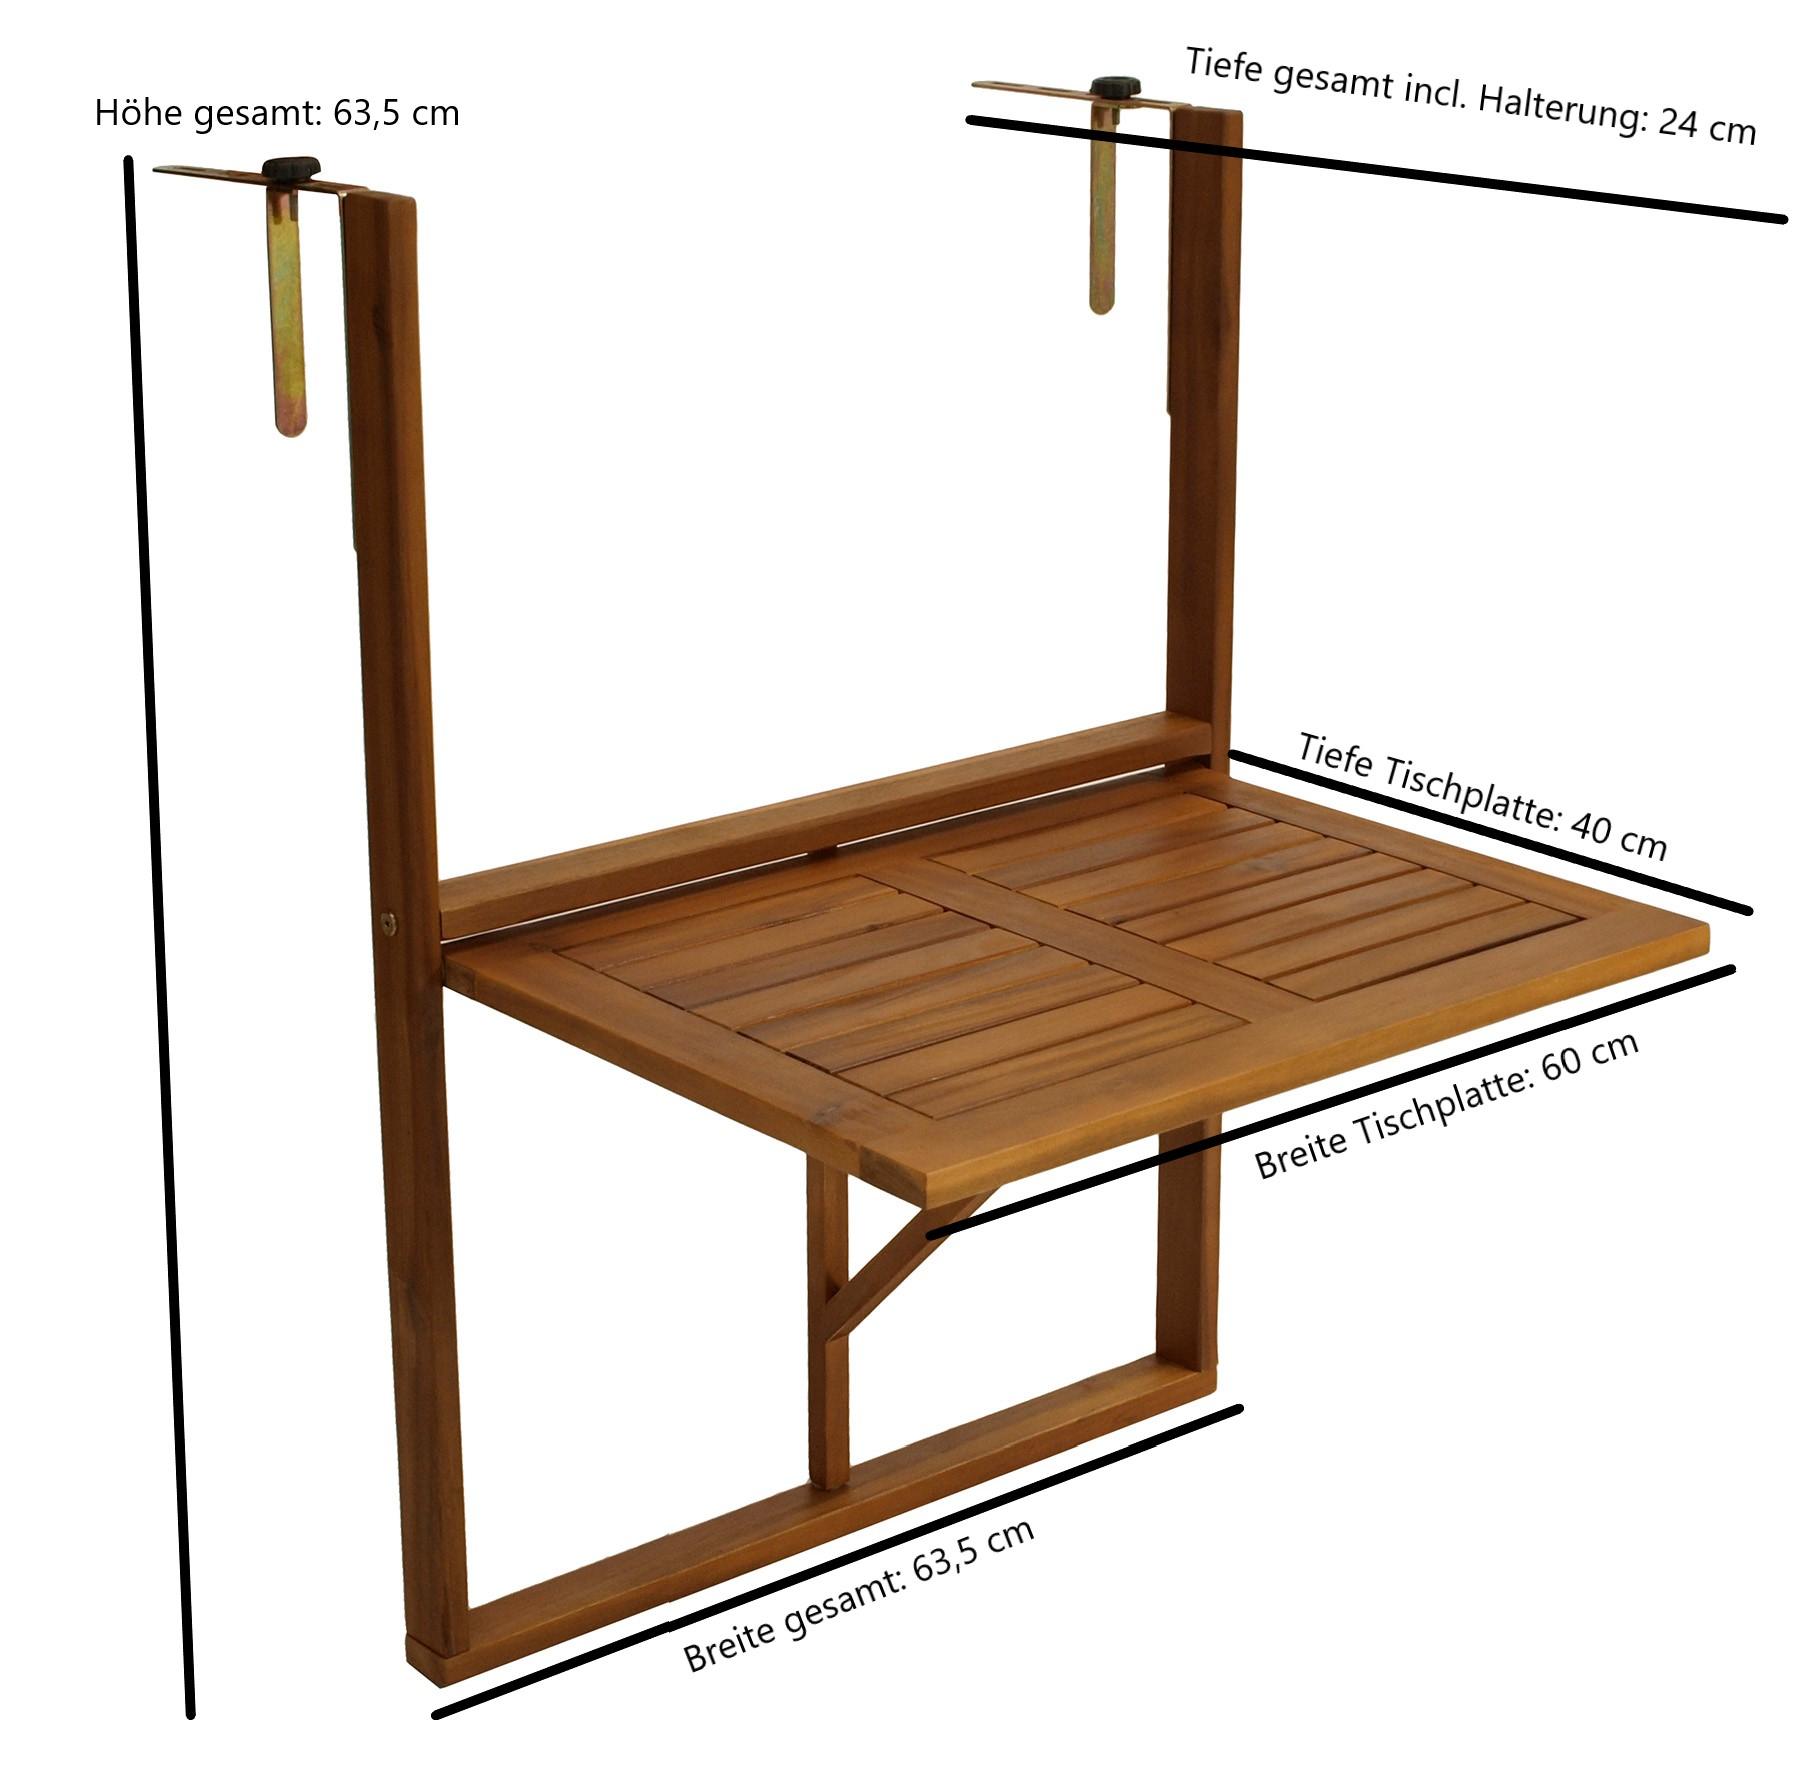 Balkonhängetisch 60x40cm, Akazie geölt, verstellbare Halterung, FSC®-zertifiziert